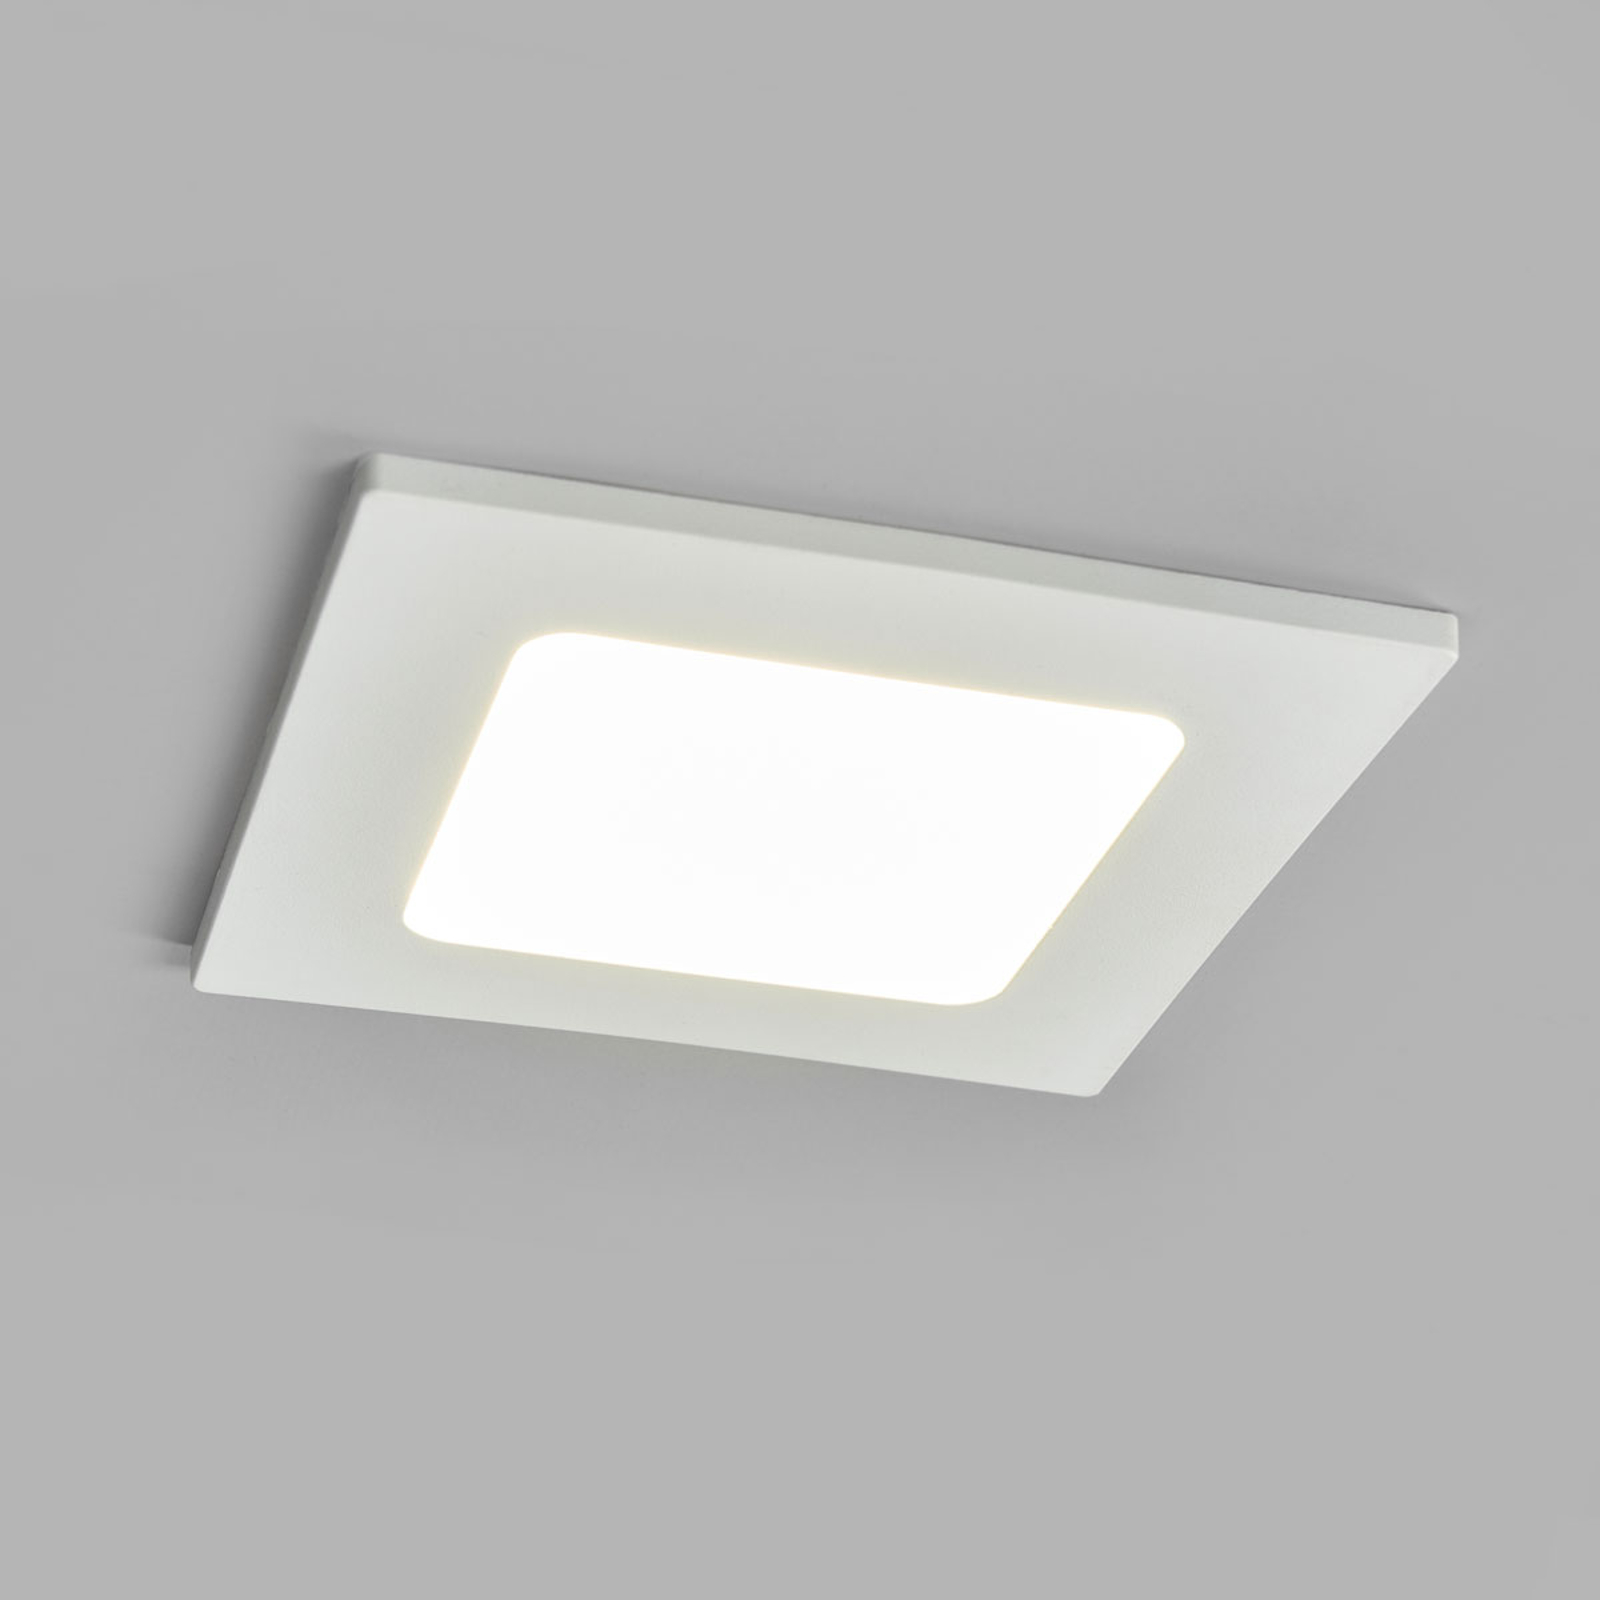 Acquista Downlight LED Joki bianco 4000K angolare 11,5cm